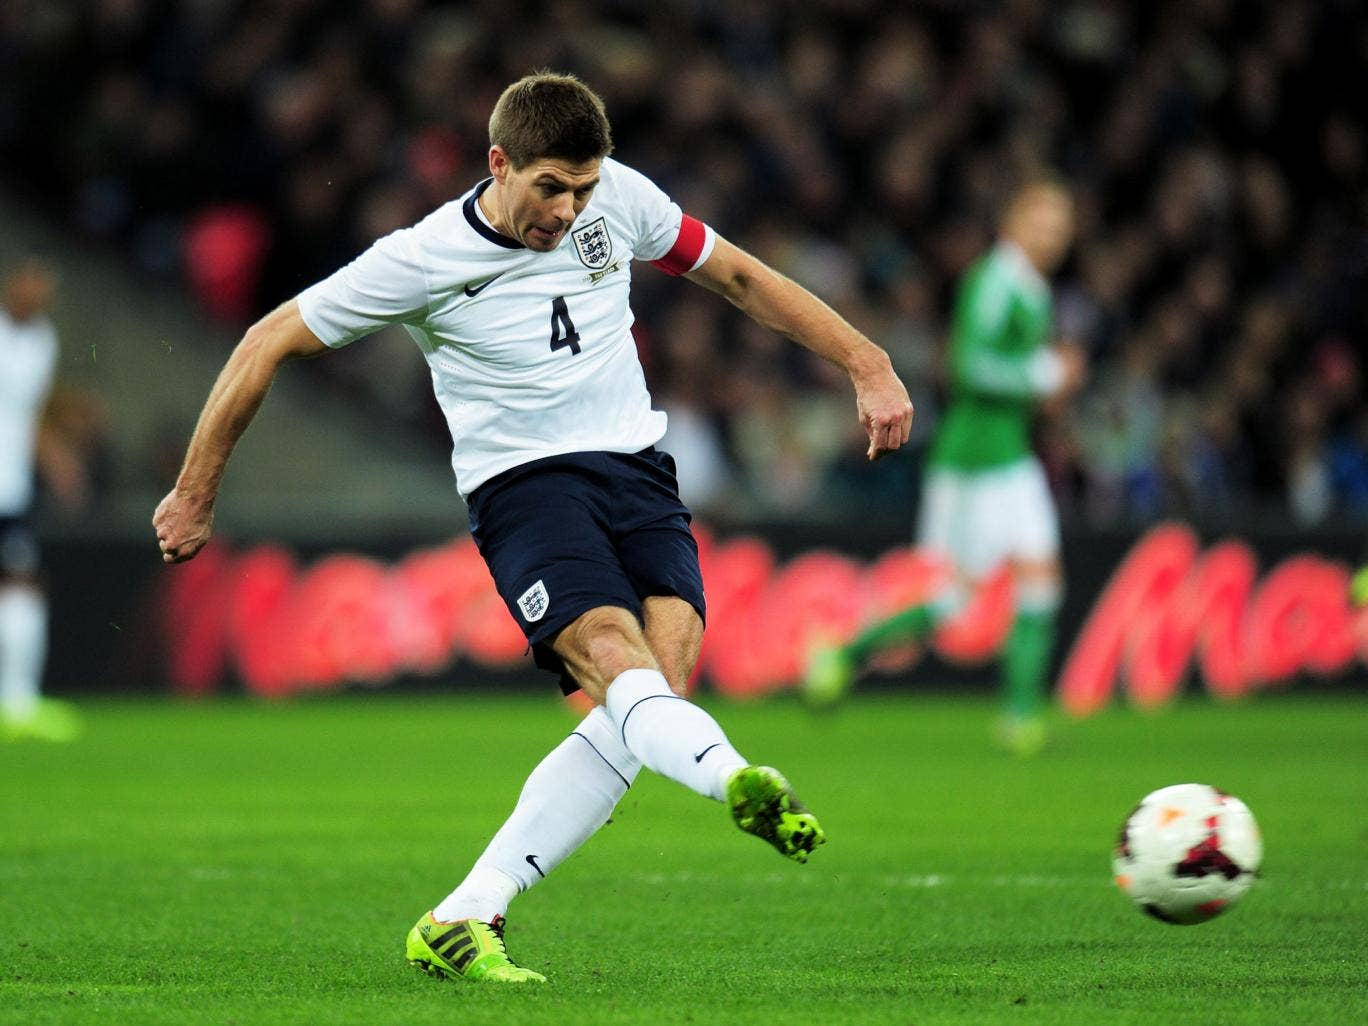 Steven Gerrard on England duty in a friendly against Germany in November 2013